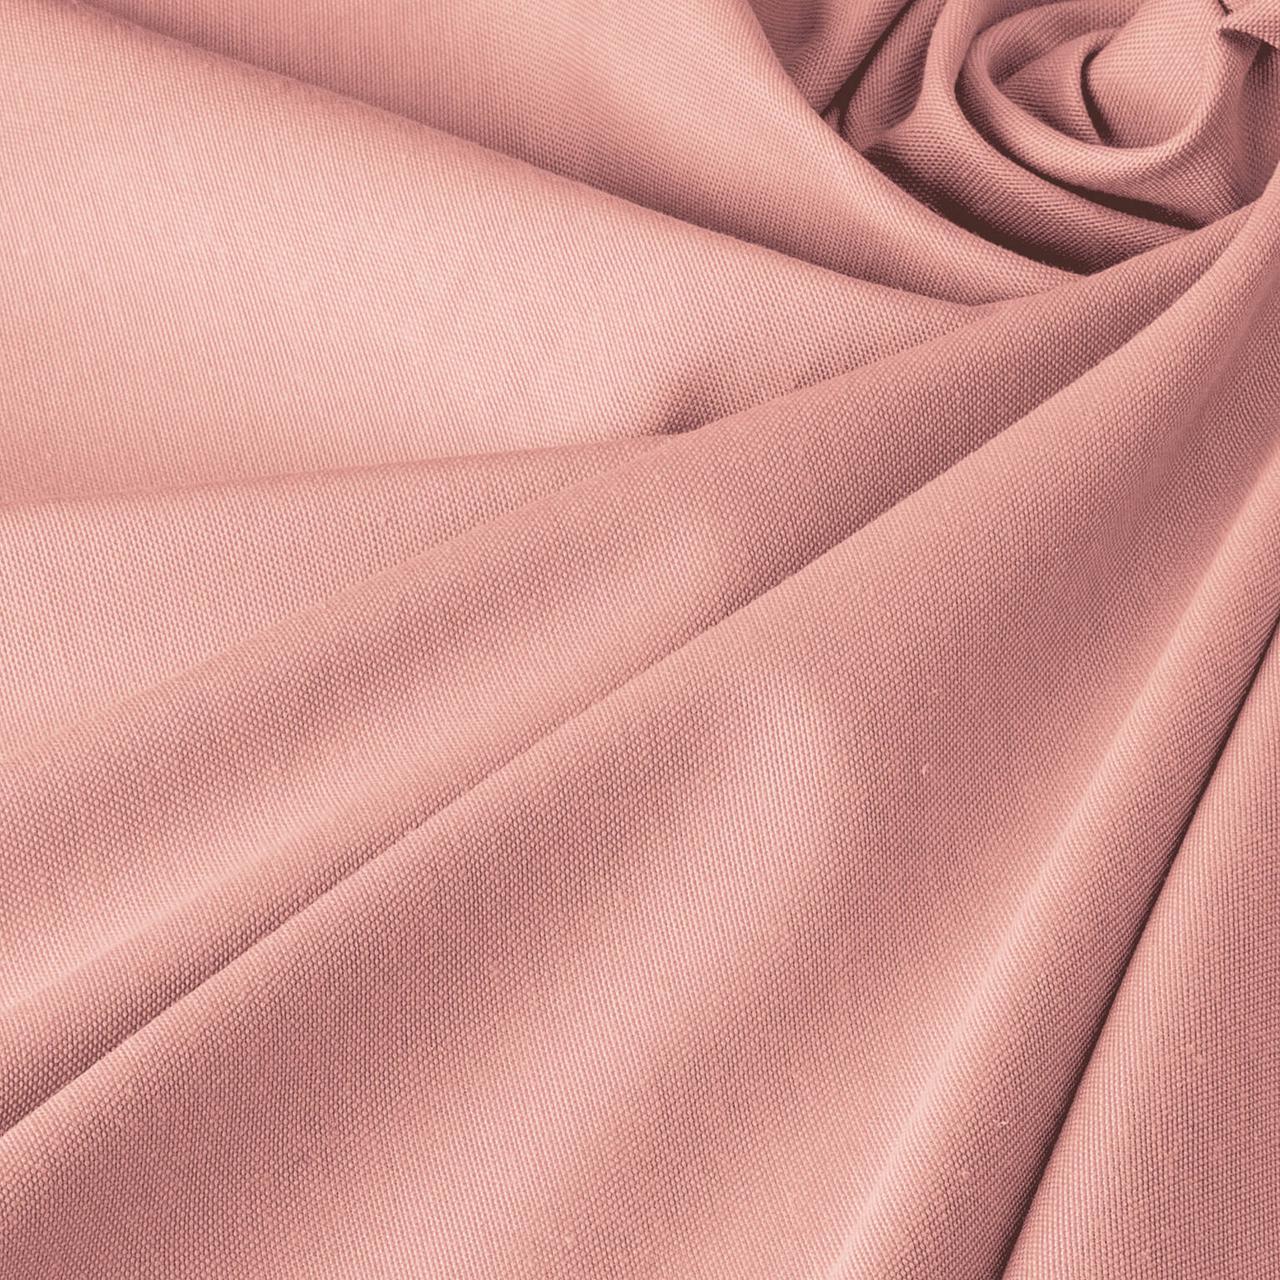 Ткань для штор и скатертей Teflon TDRK v 212